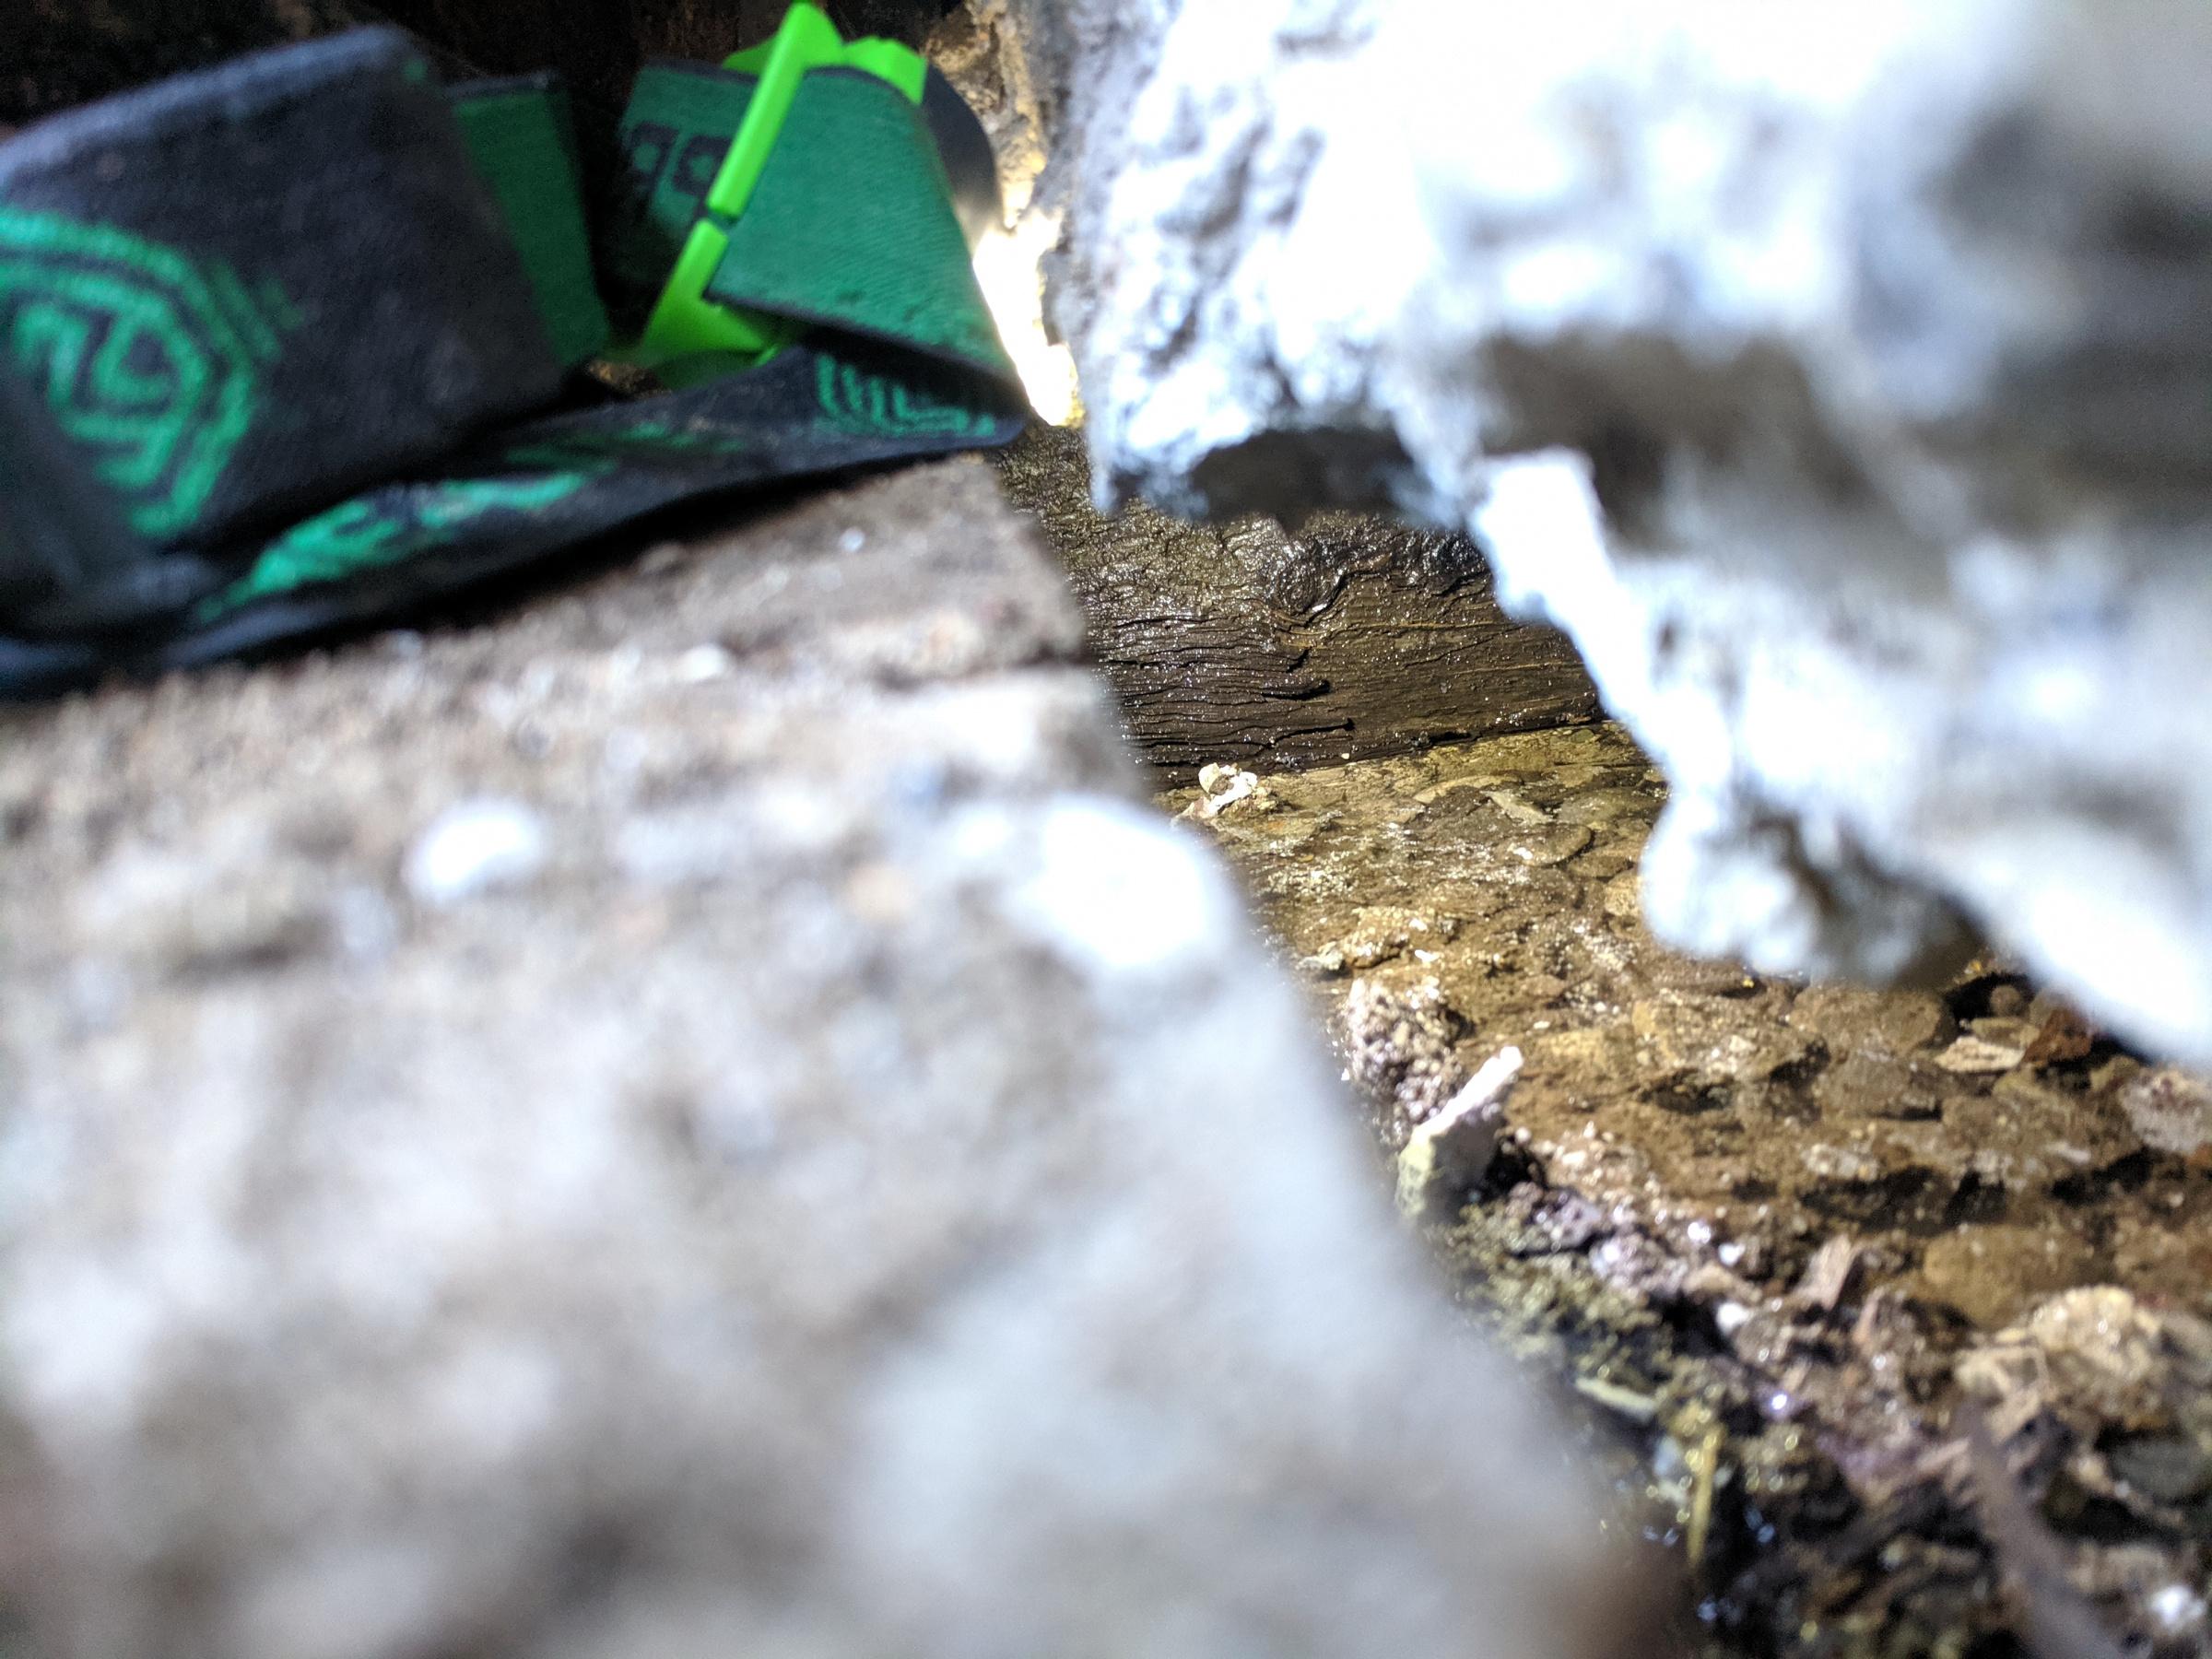 Repair Garage Threshold & Posts-9.jpg